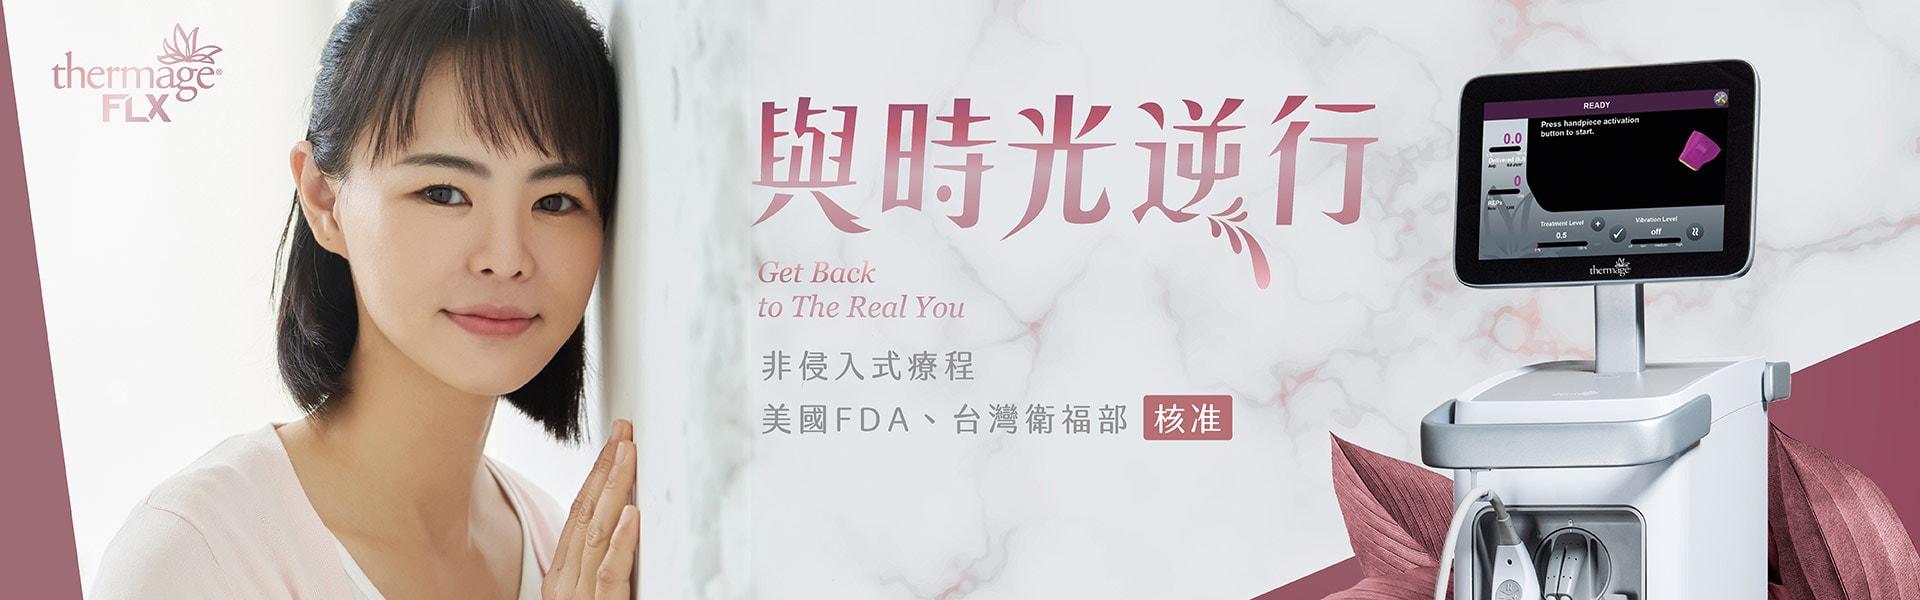 01-banner-(1)